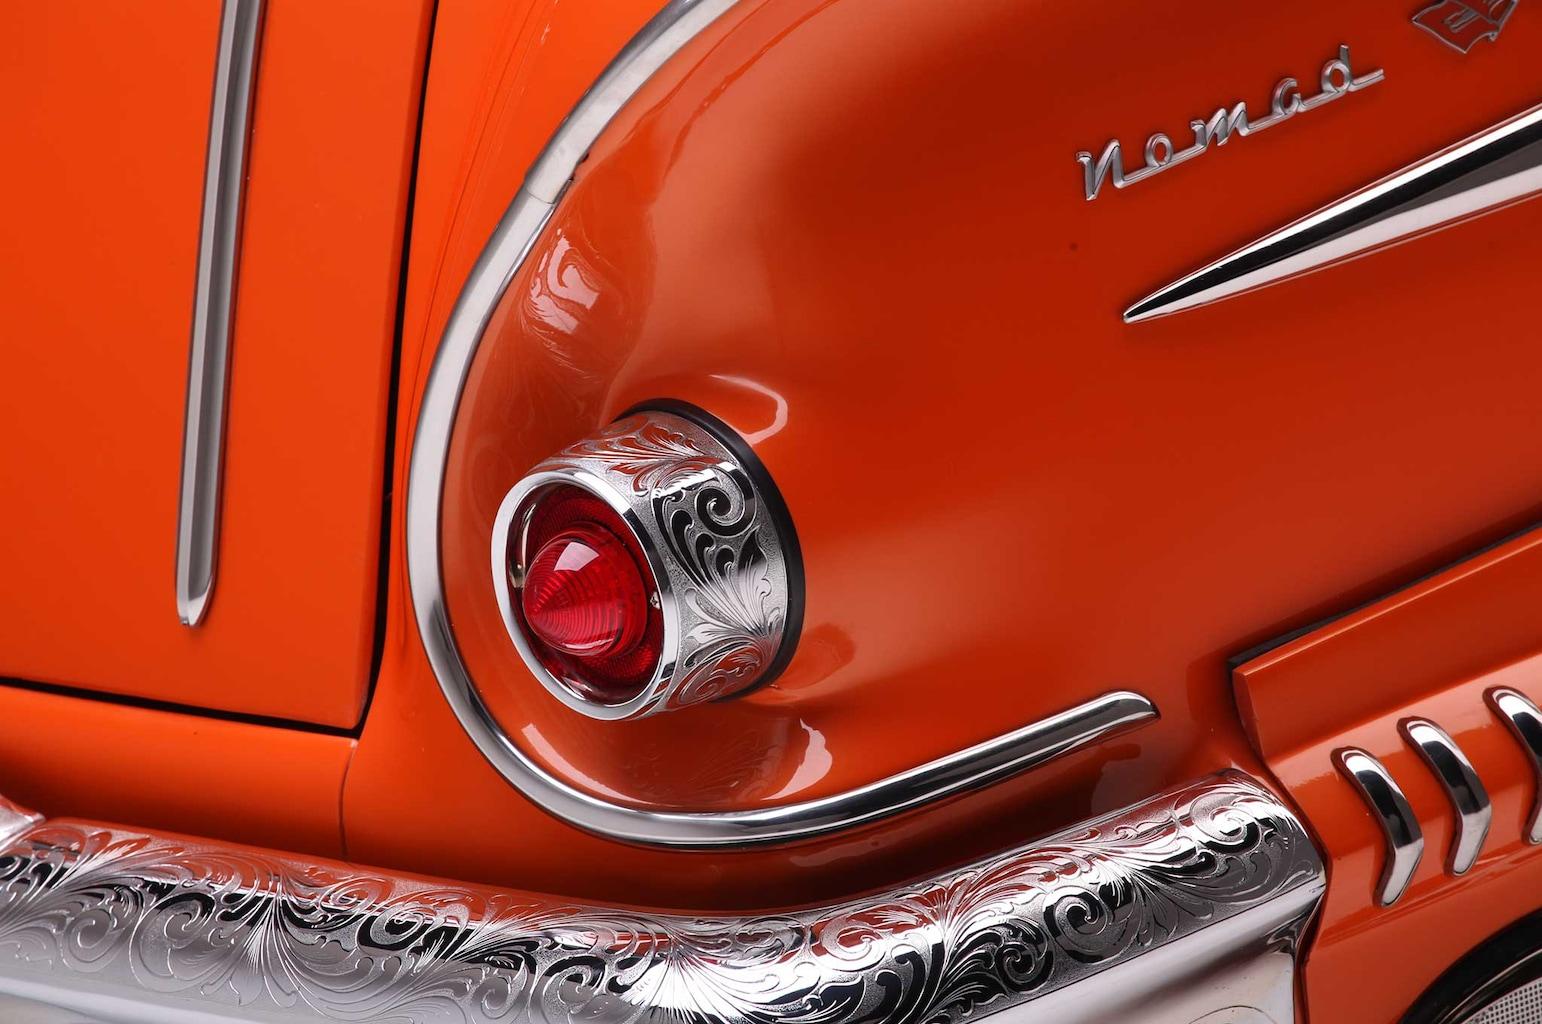 1958 chevrolet nomad taillight 013